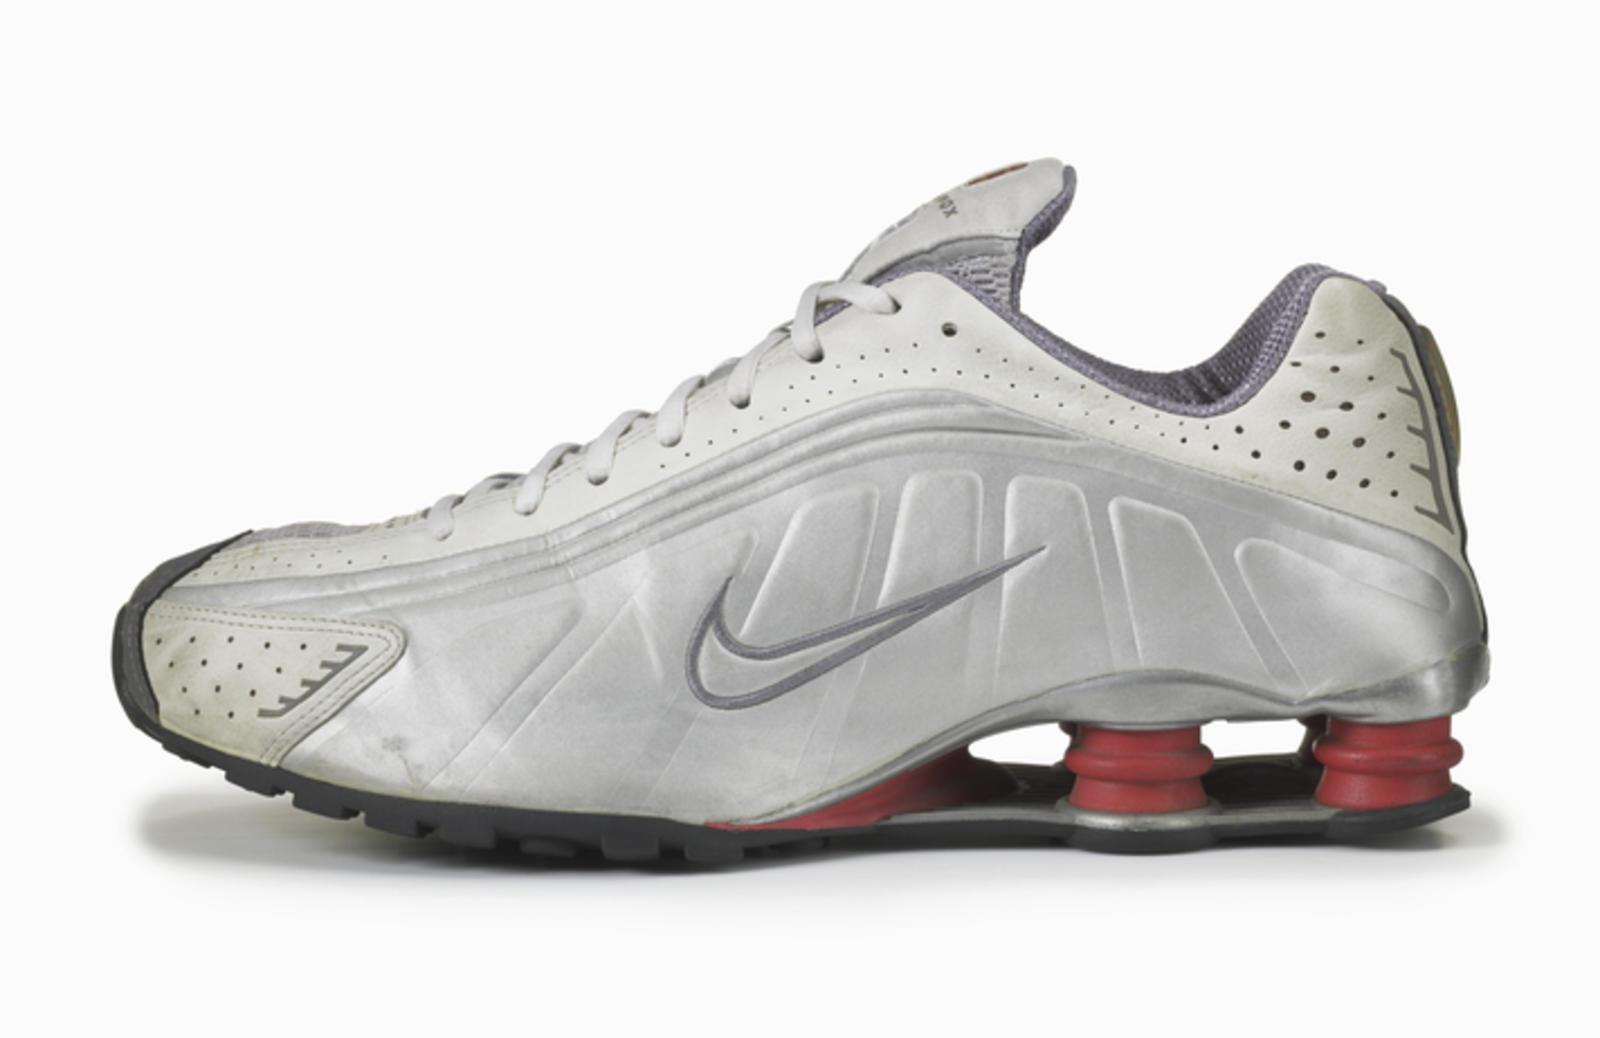 Nike shox r4 2000